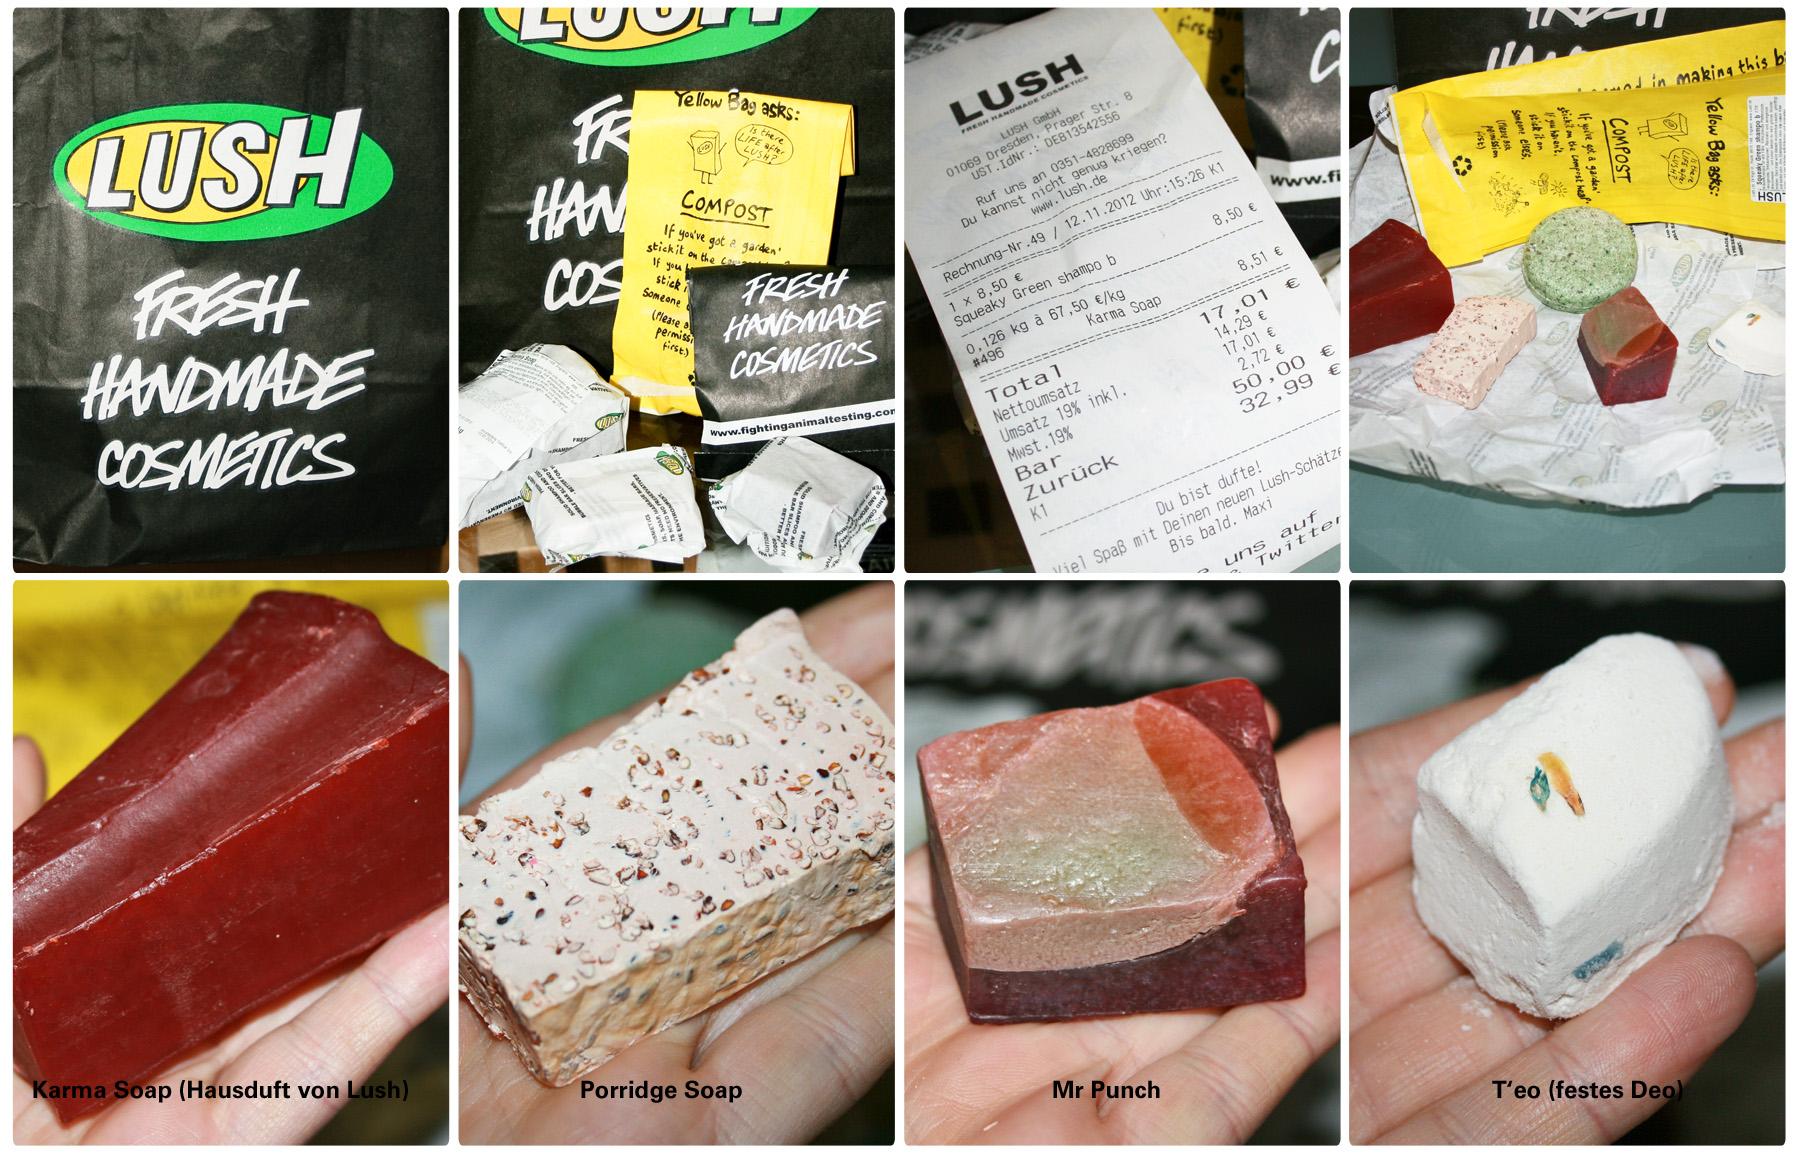 LUSH Seifen und Deo - Karma Soap, Porridge Soap, Mrs Punch Fruity, T'eo, Squeeky Green shampoo bar